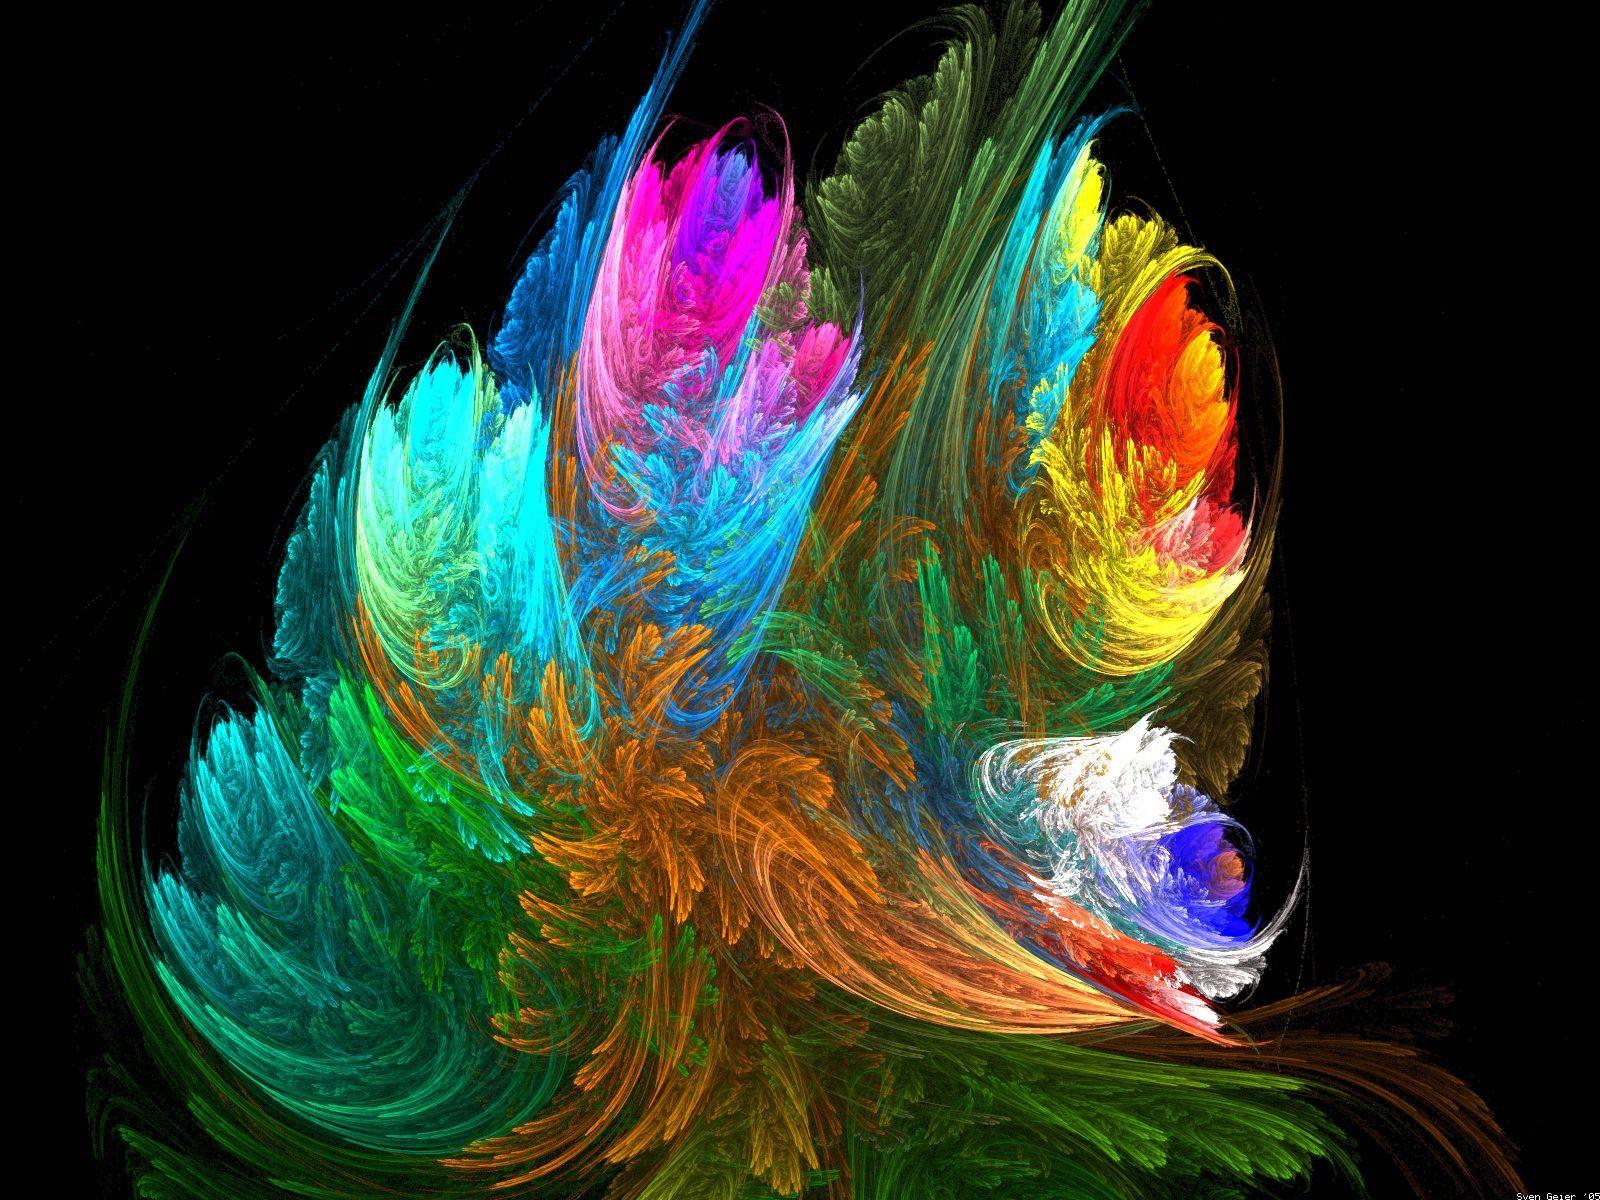 http://1.bp.blogspot.com/-ktmC0VzTl60/TgM2XgB-VnI/AAAAAAAAIy0/VN3DJyqE0nI/s1600/Amazing+wallpapers+for+desktop%252Camazing+nature+wallpapers%252Camazing+wallpaper%252Camazing+3d+wallpapers%252C%252C3.jpg